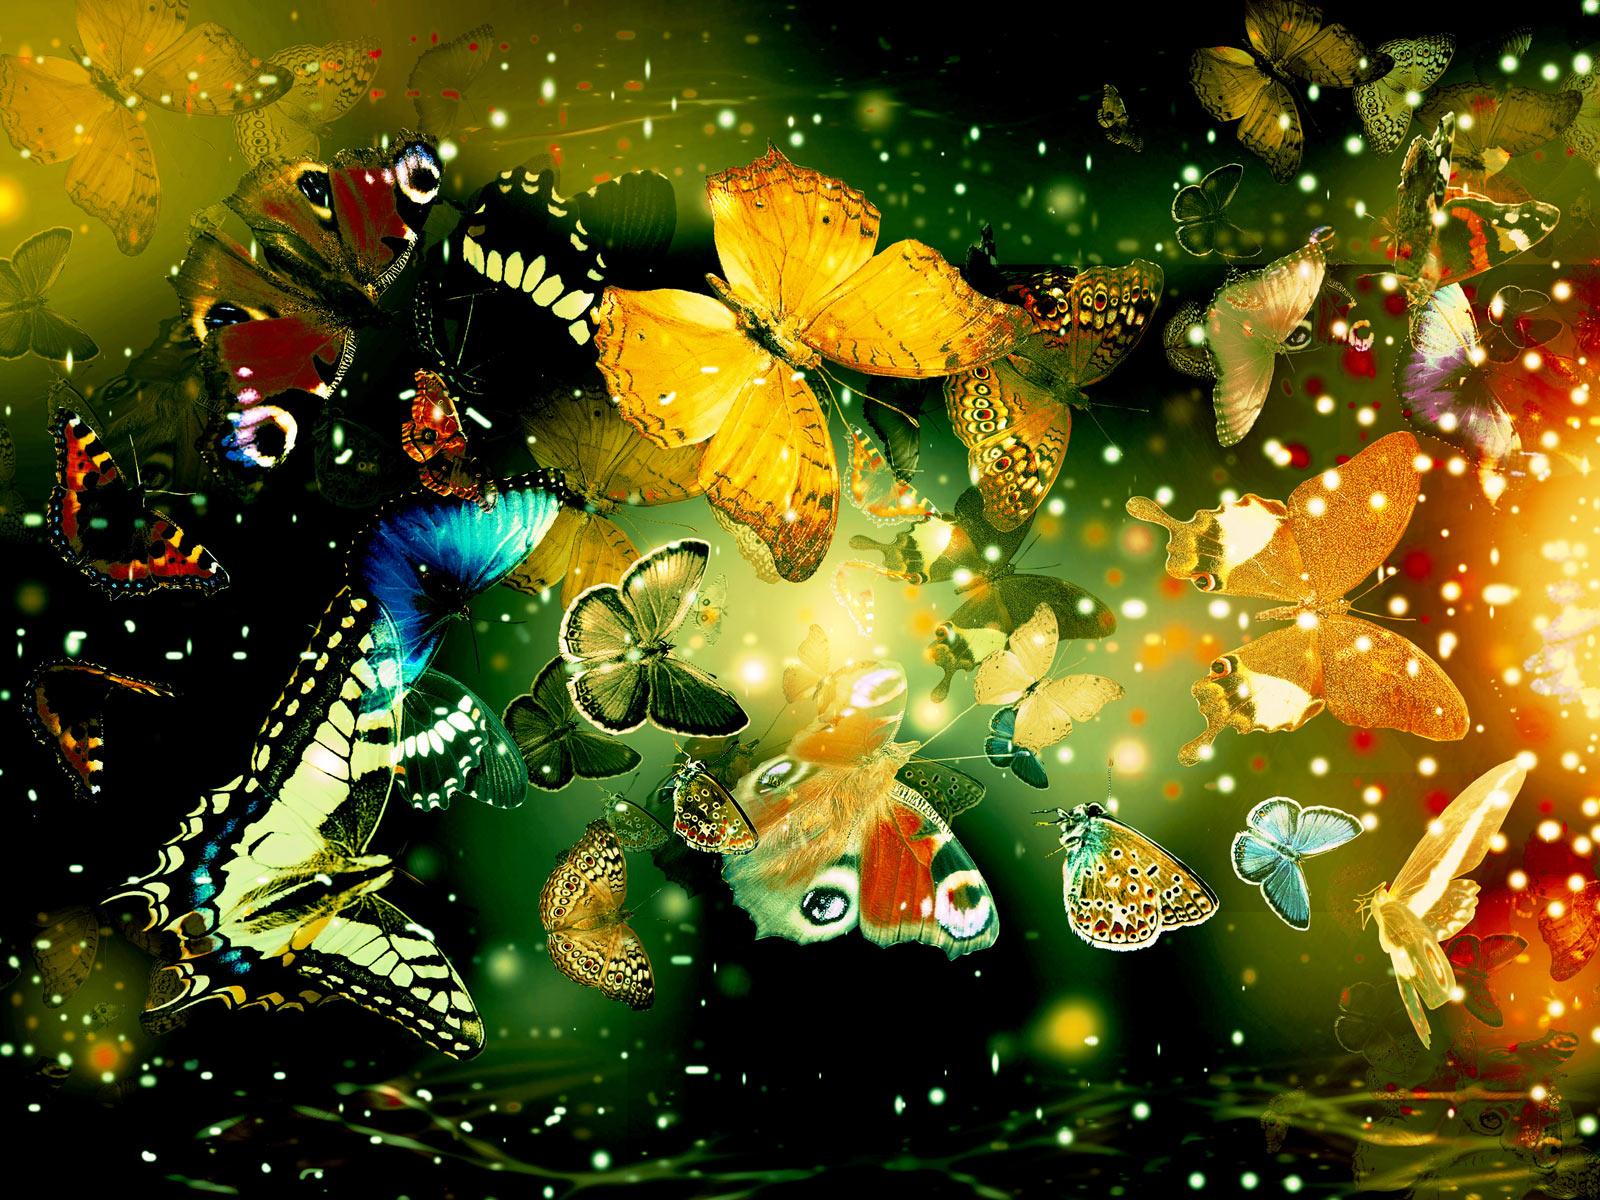 http://2.bp.blogspot.com/_QX-IXJNA8os/S_Omzp1GodI/AAAAAAAAEJQ/lzvLV0iQb0o/s1600/Butterflies_+%2819%29.jpg